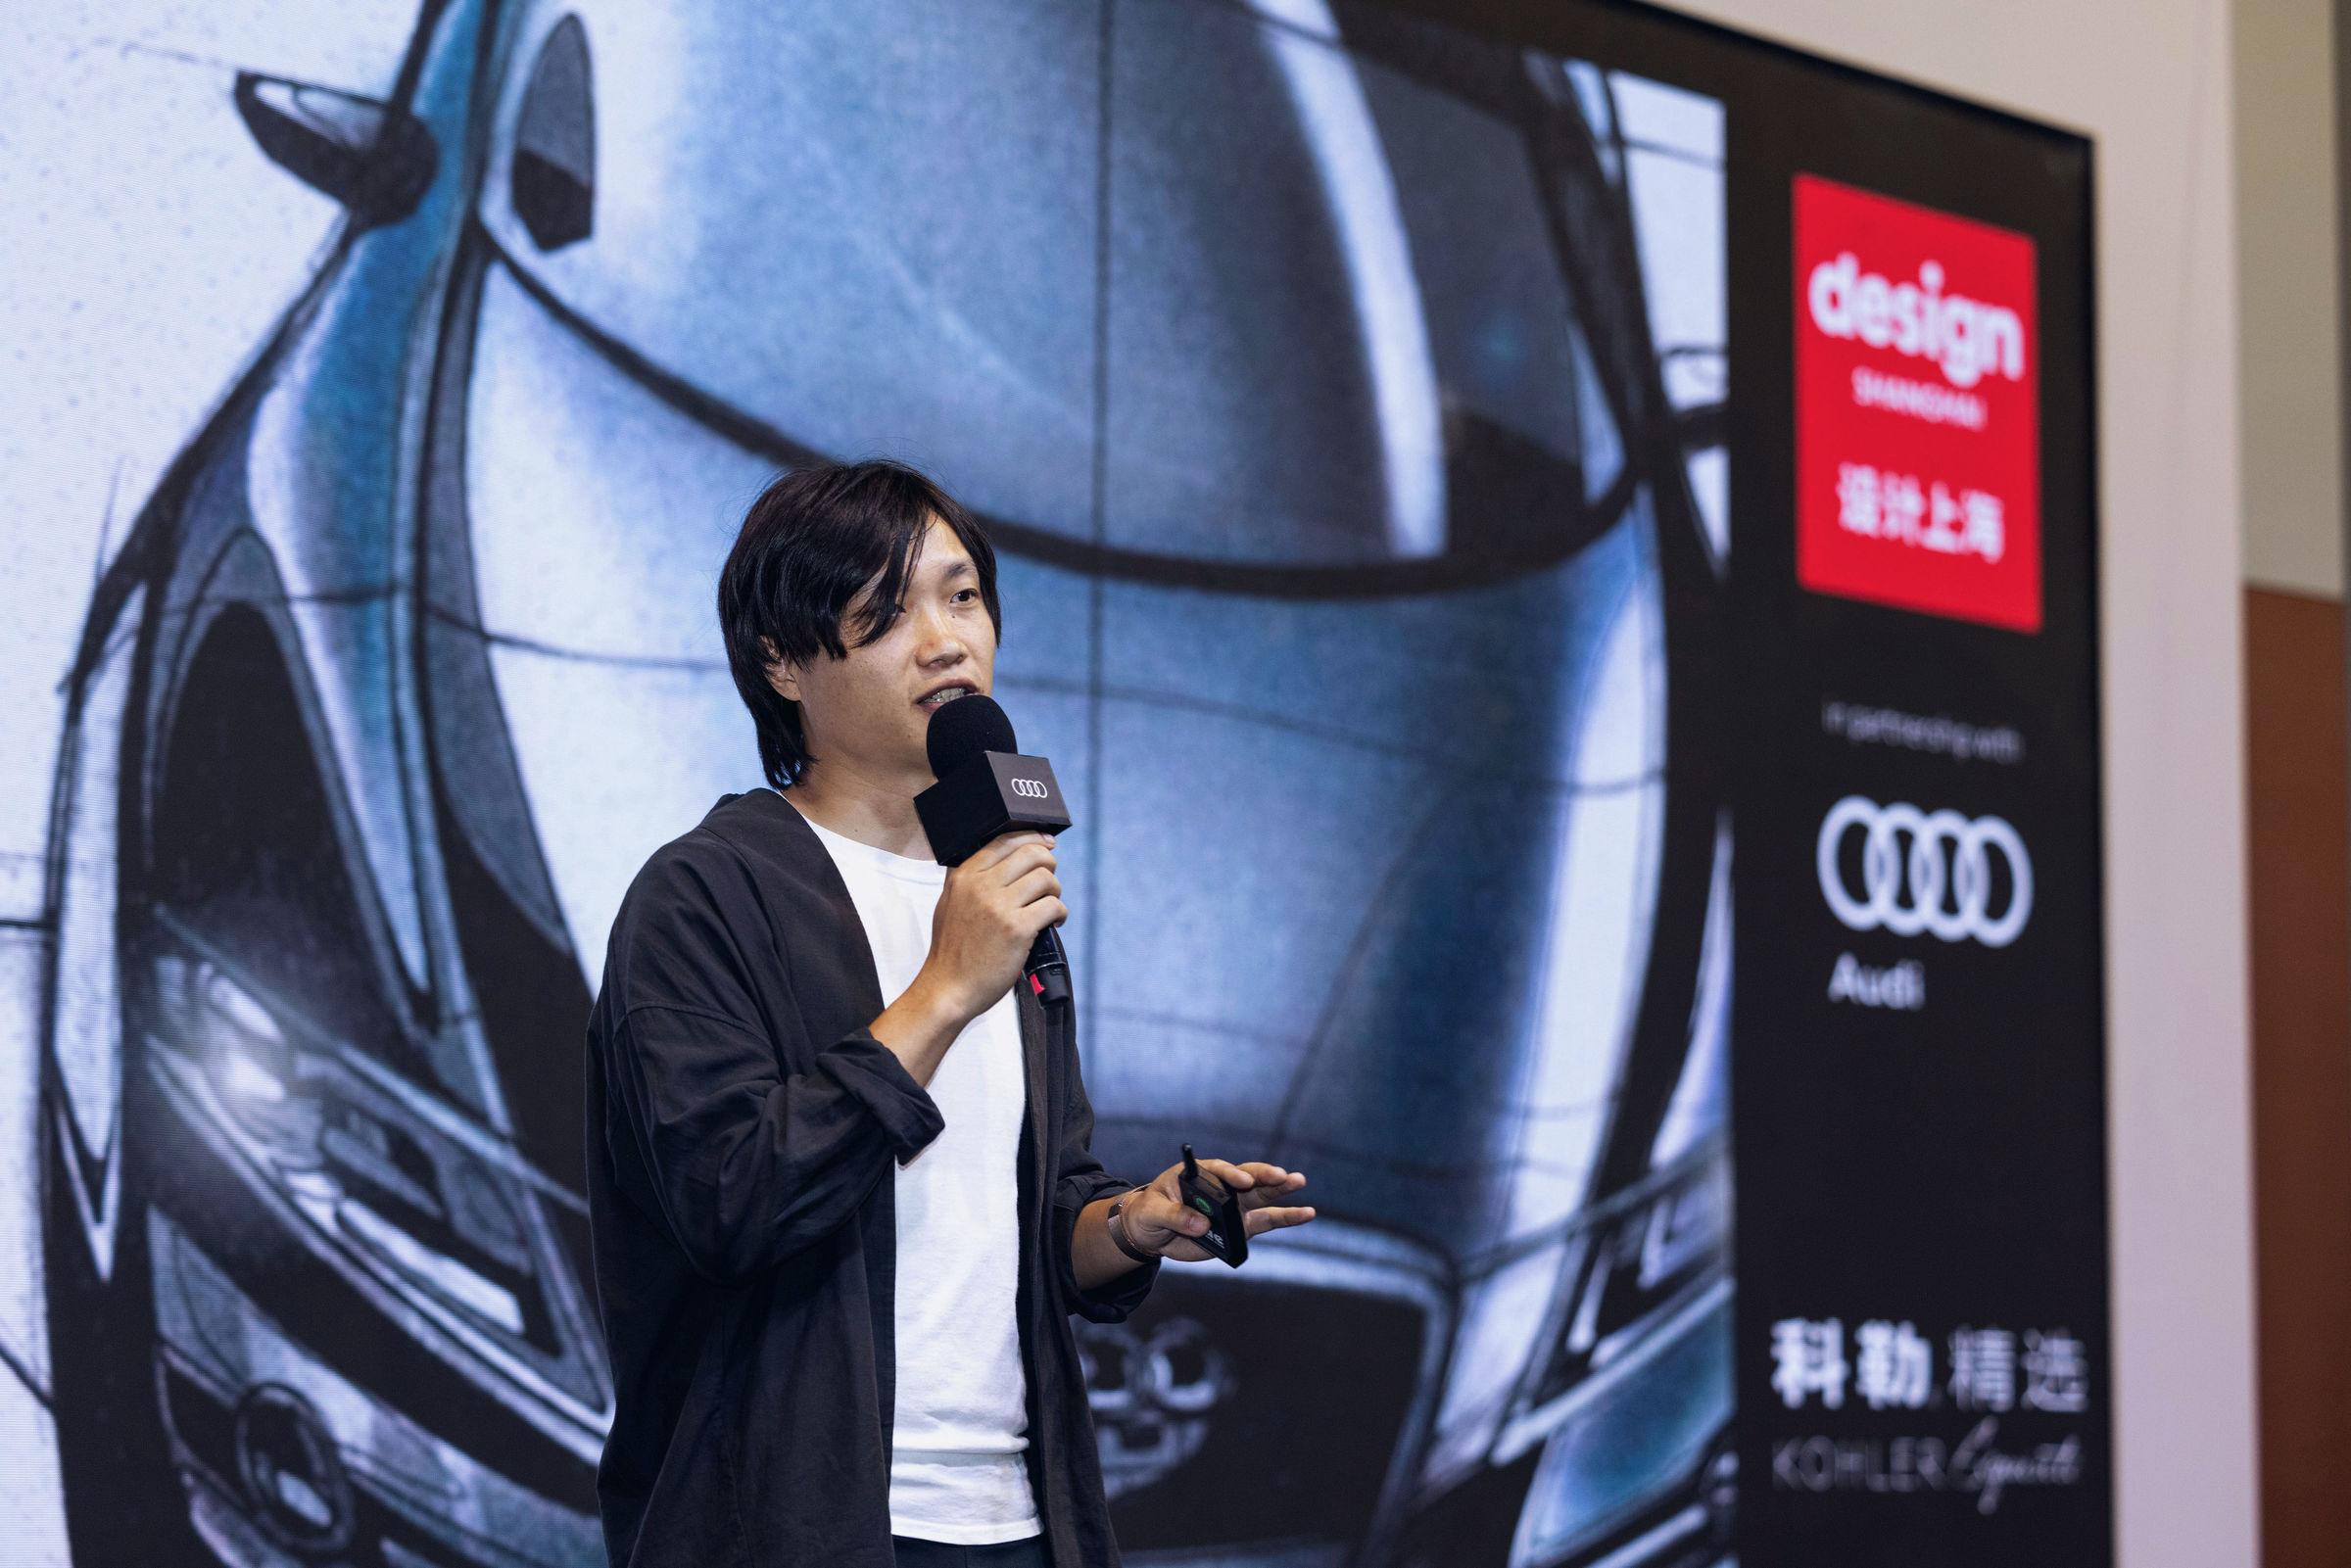 Regenerative Design: Audi at Design Shanghai 2021 in cooperation with Stella McCartney - Image 2